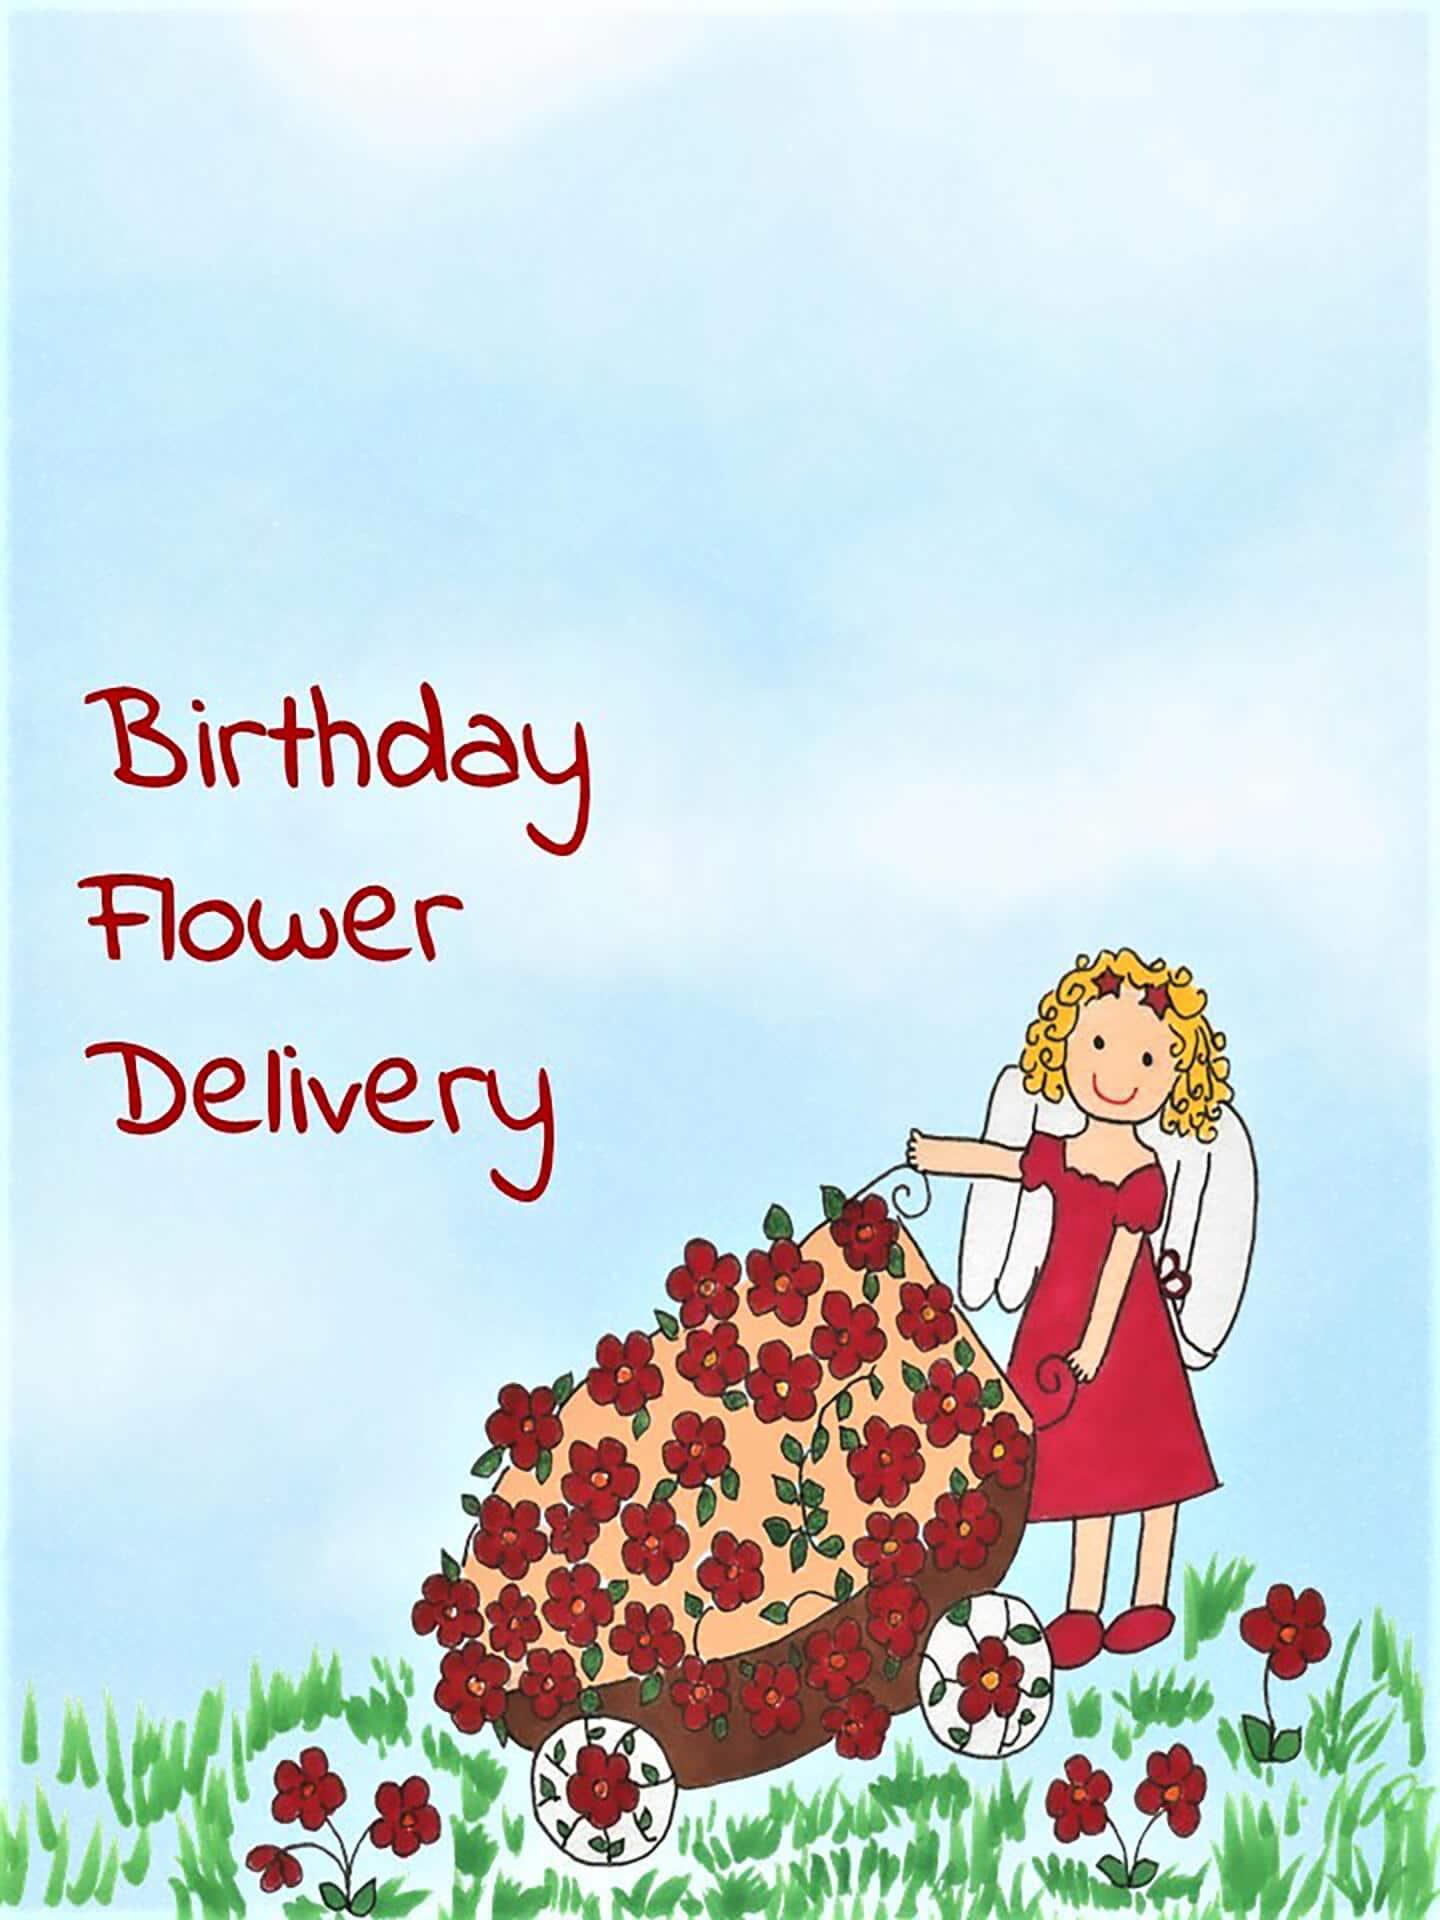 Birthday Flower Delivery eCard